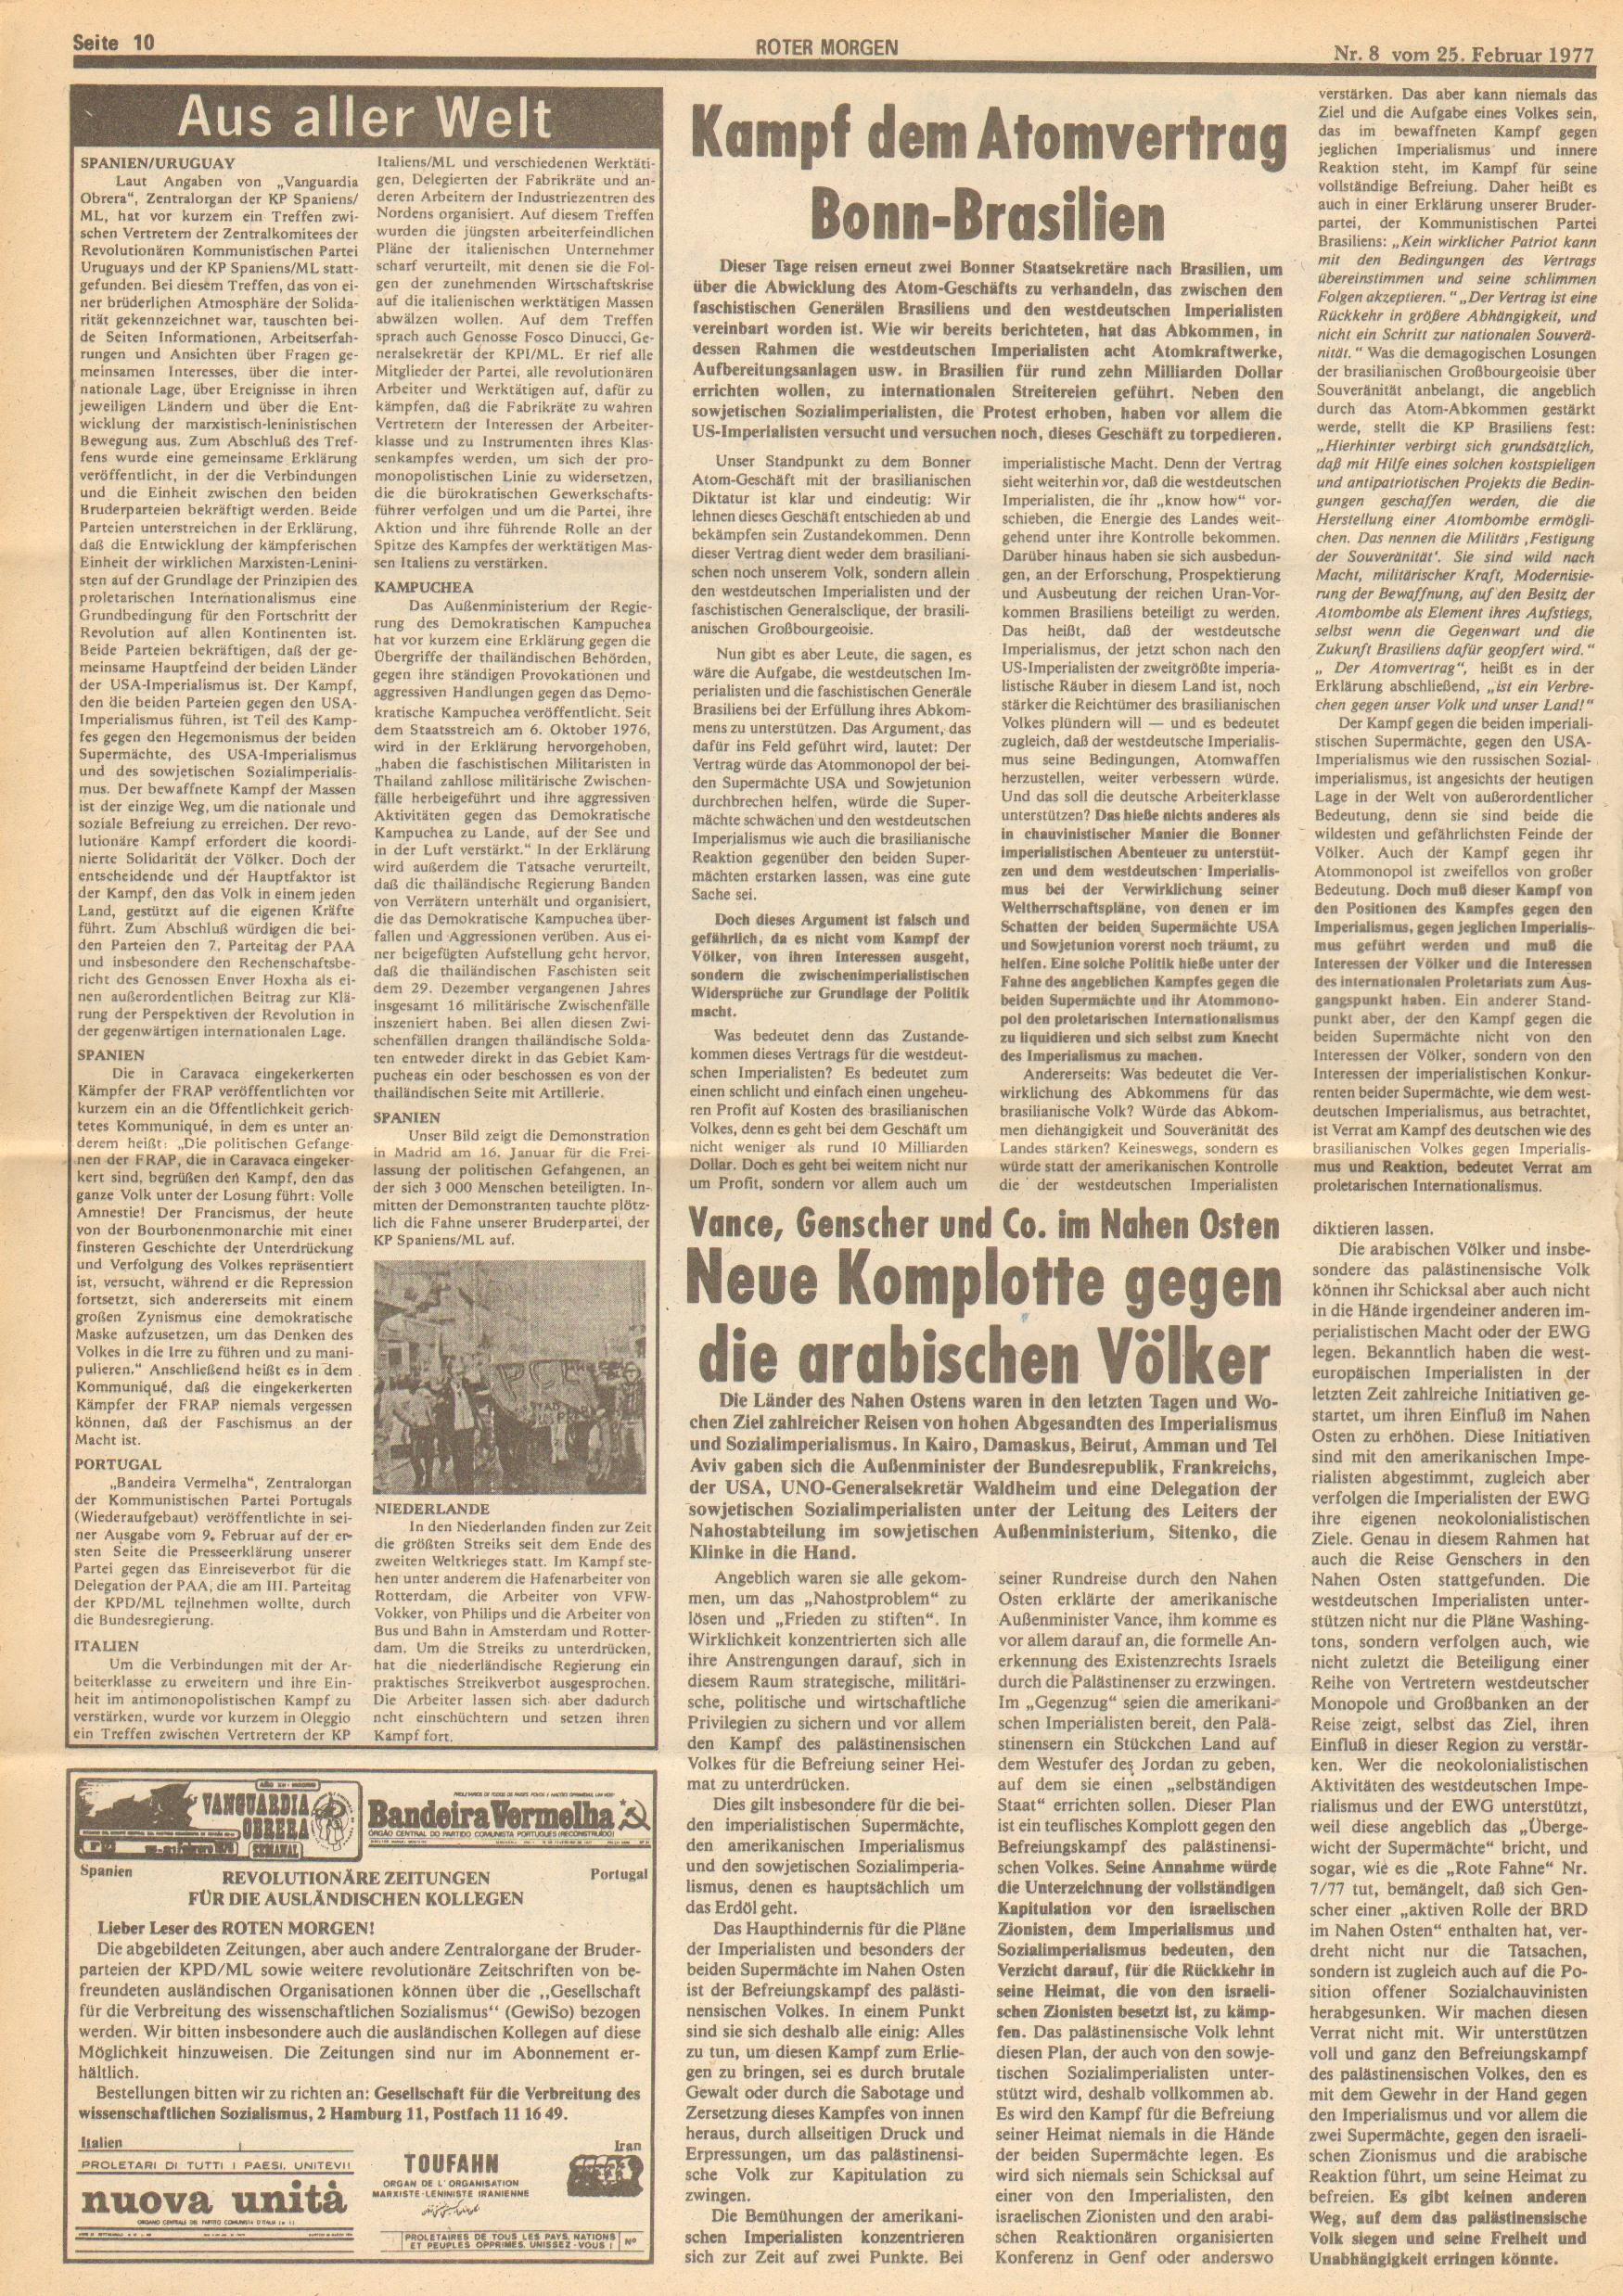 Roter Morgen, 11. Jg.,25. Februar 1977, Nr. 8, Seite 10